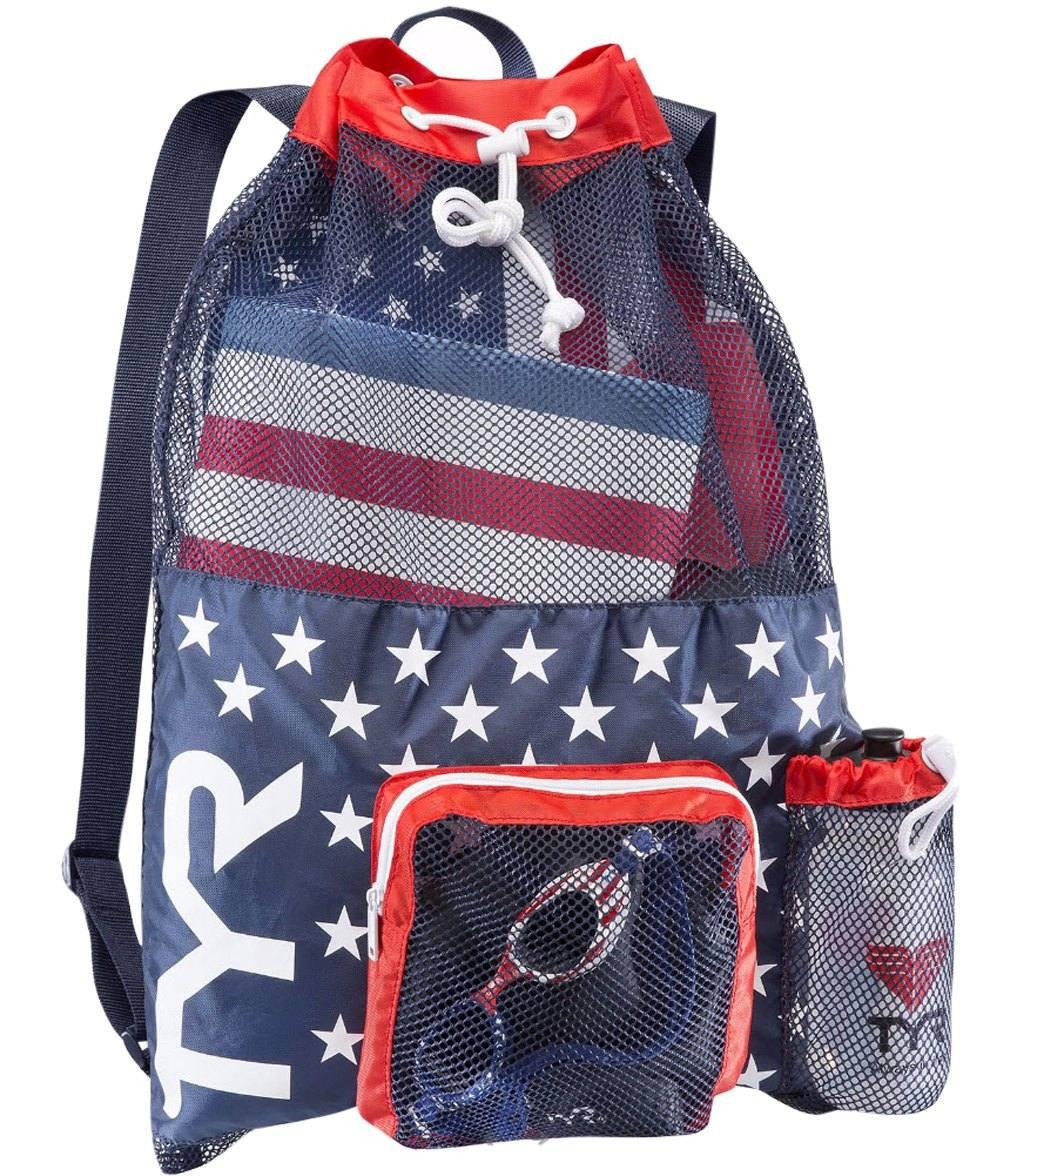 TYR Big Mesh Mummy Backpack III Swimming Bag